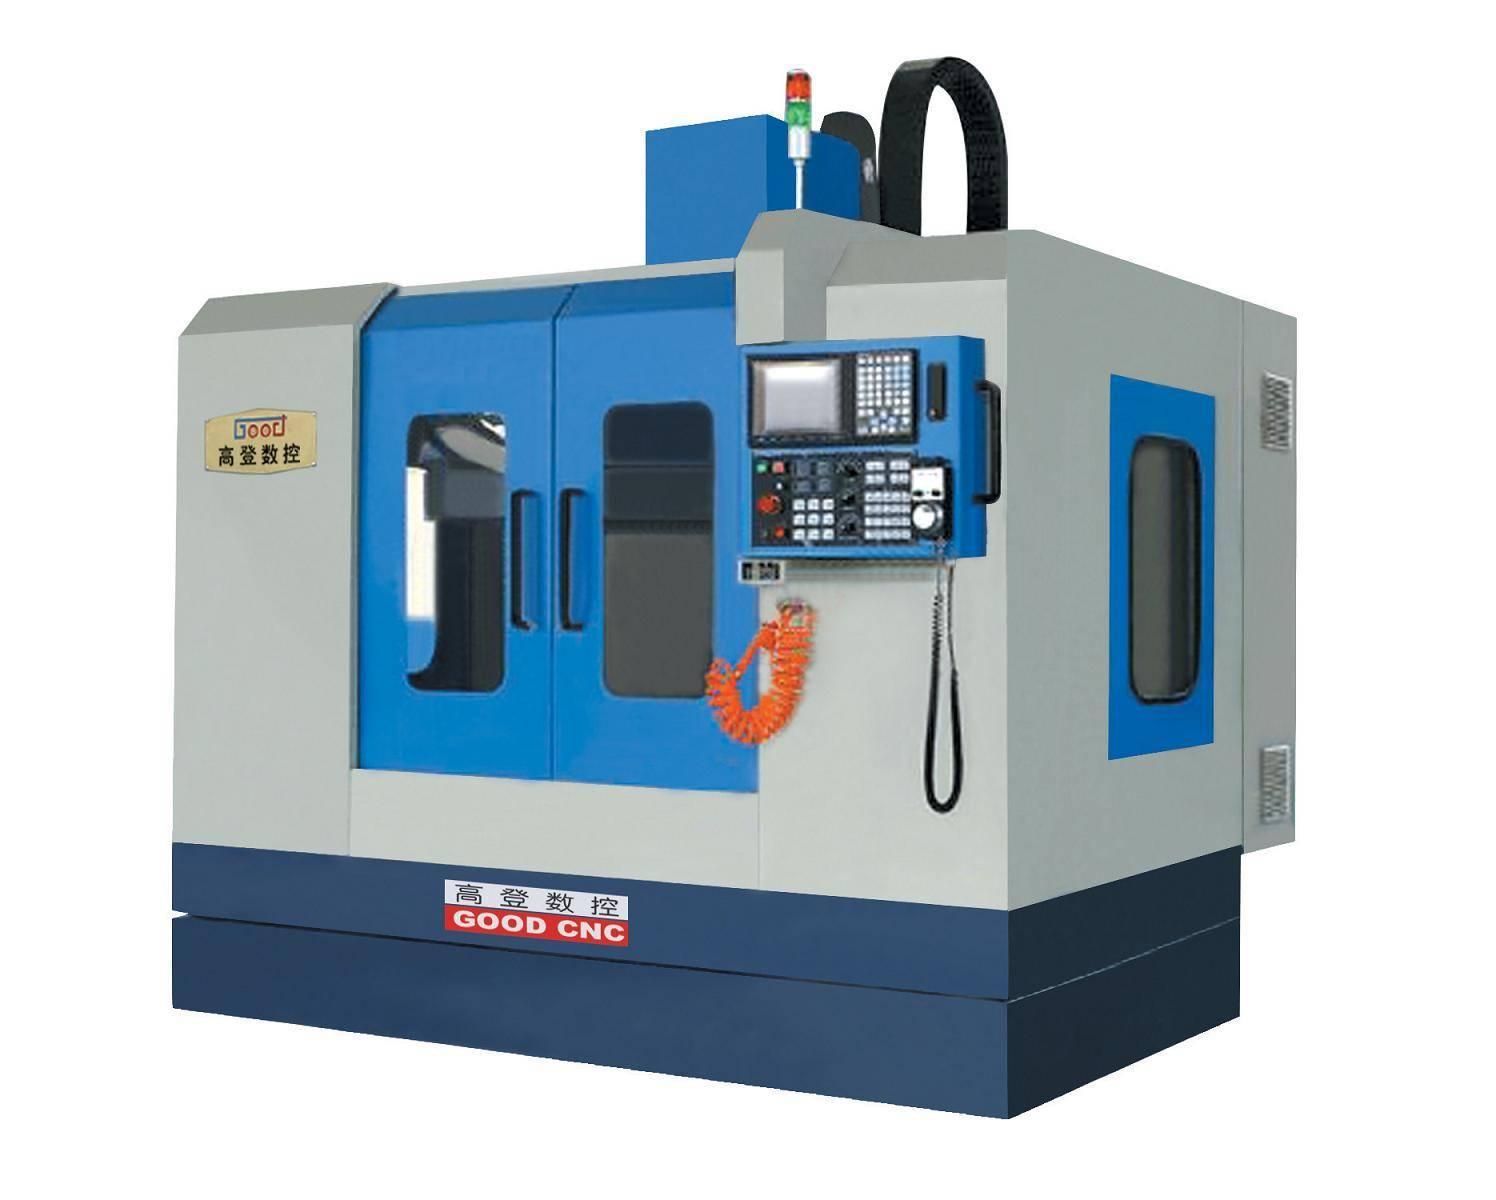 VMC850L cnc machinery tools millings